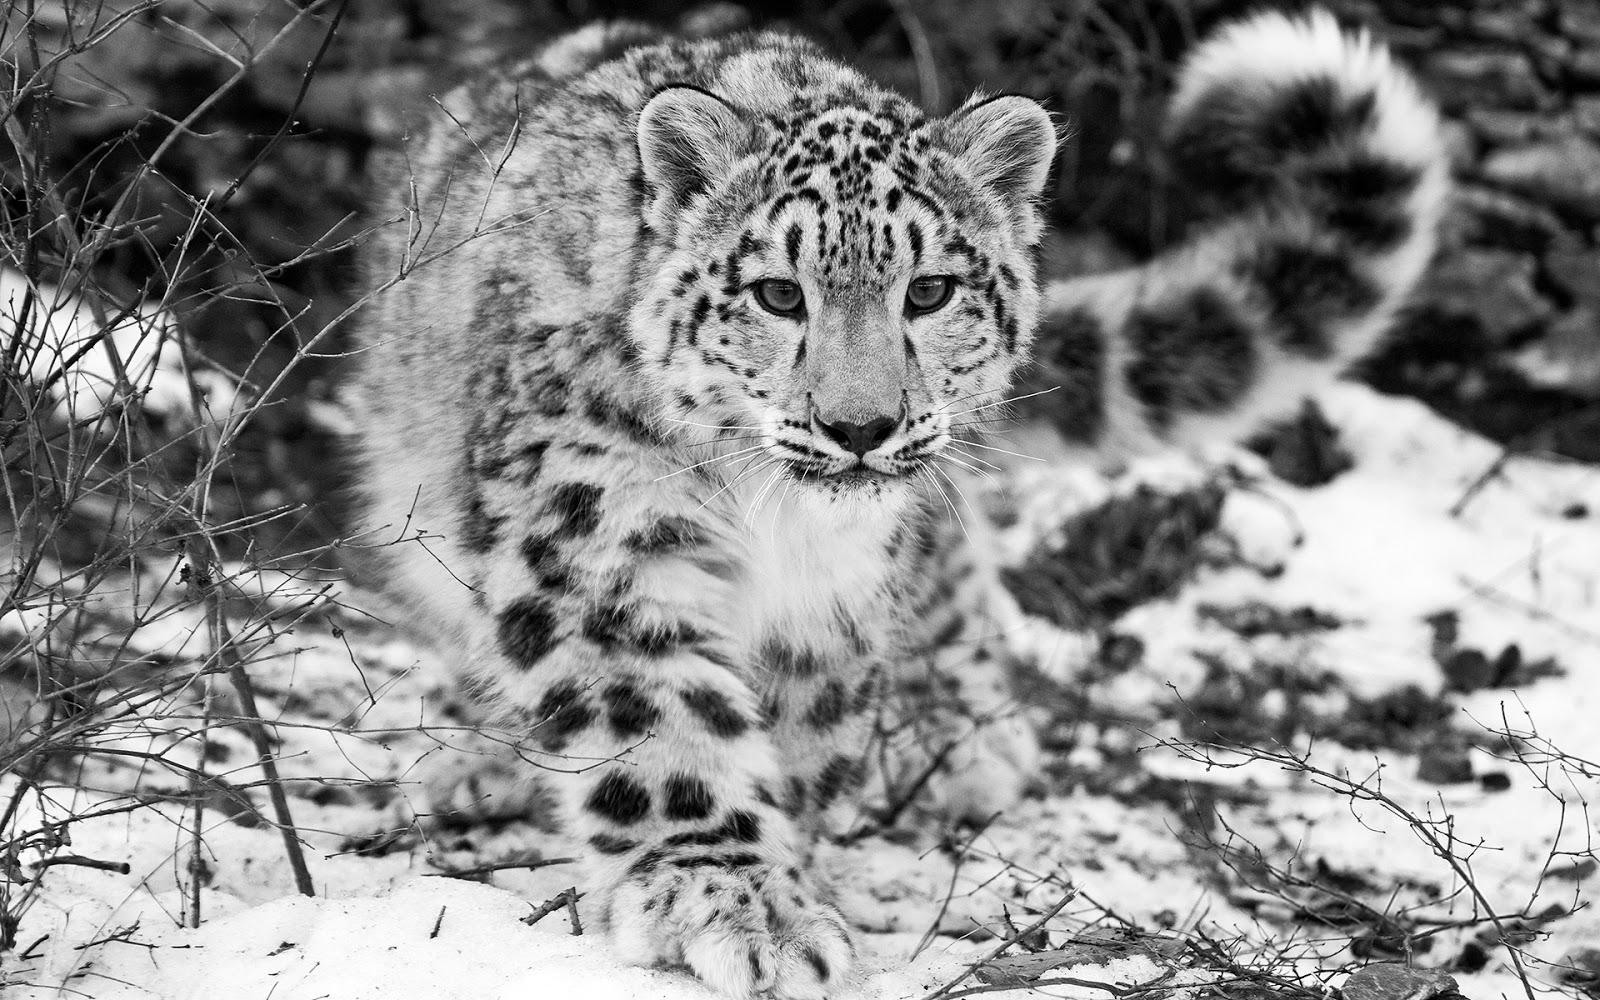 Fondo de Pantalla Animales Jaguar blanco y negro | Fondo Pantalla Online